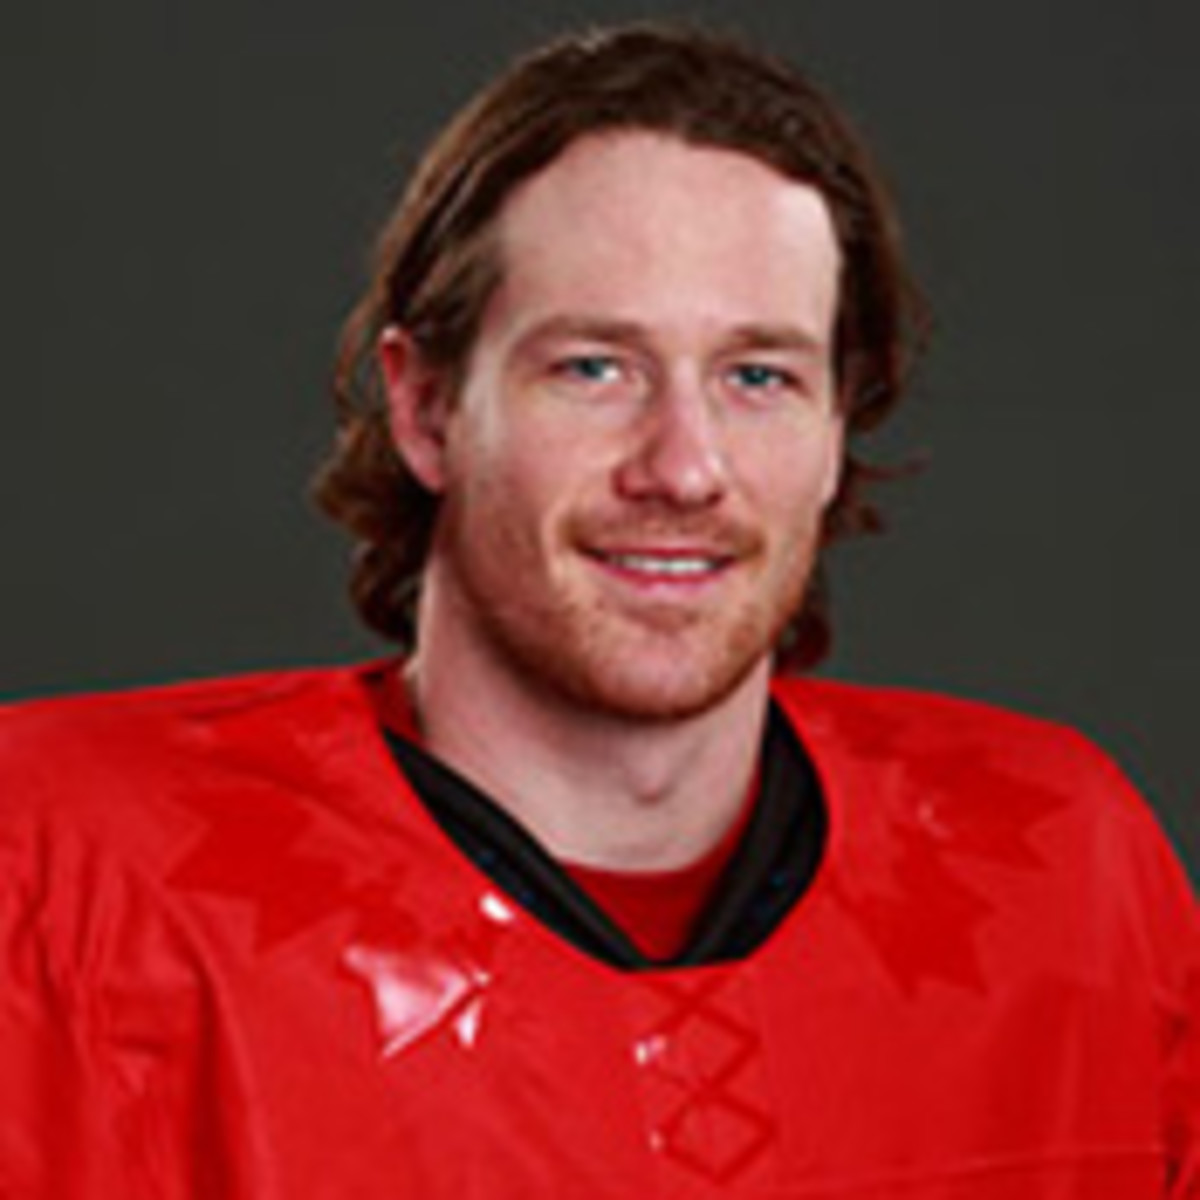 duncan keith 2014 canada men's olympic hockey